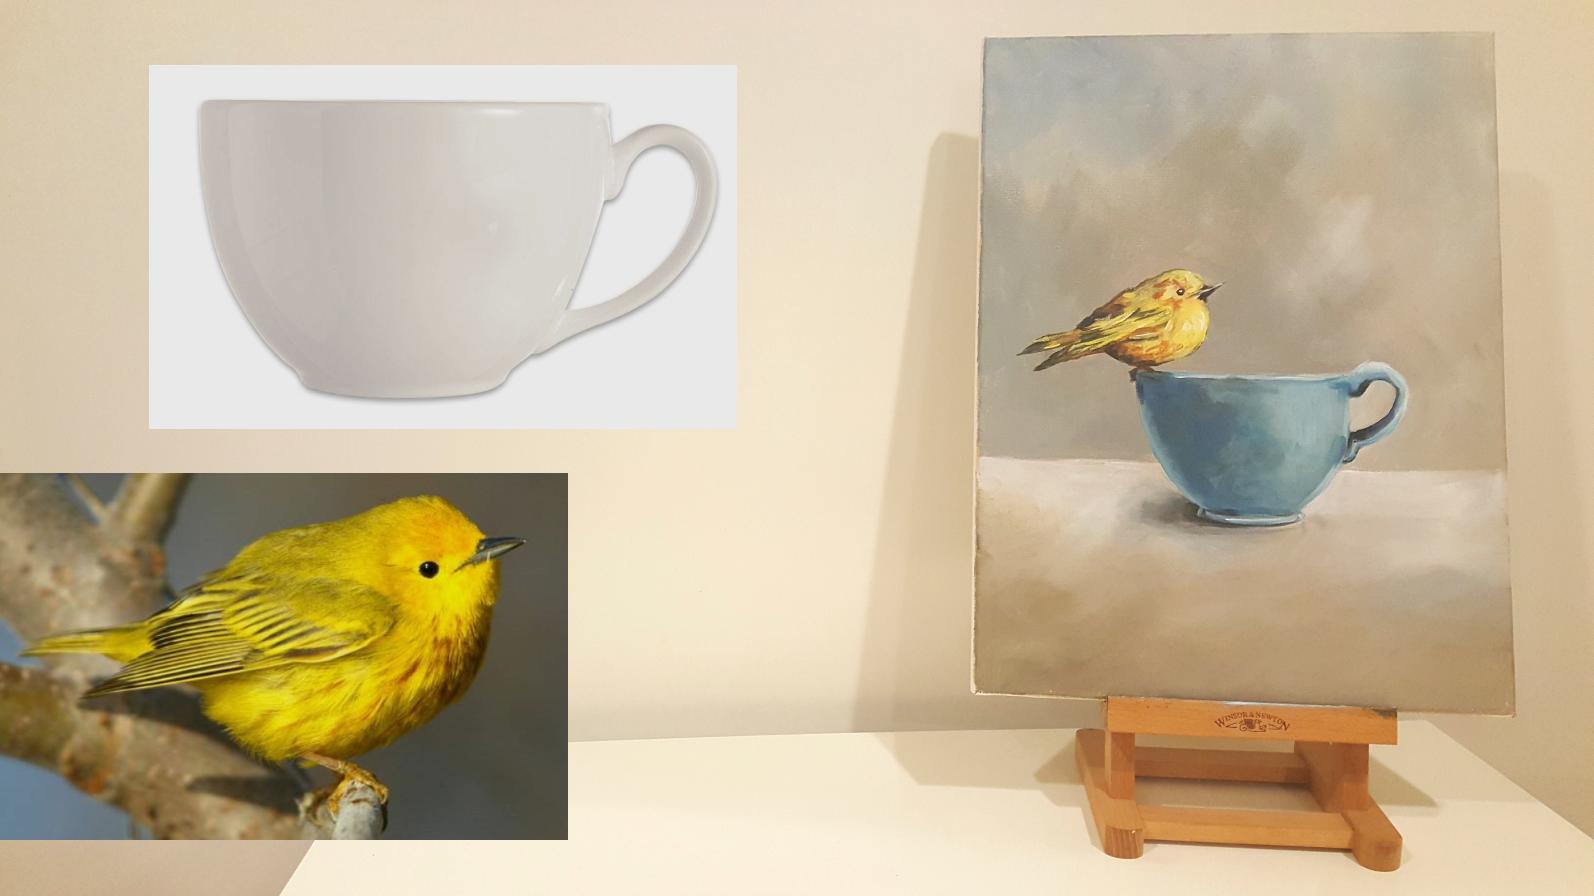 Paint a composition created from photos wokshop